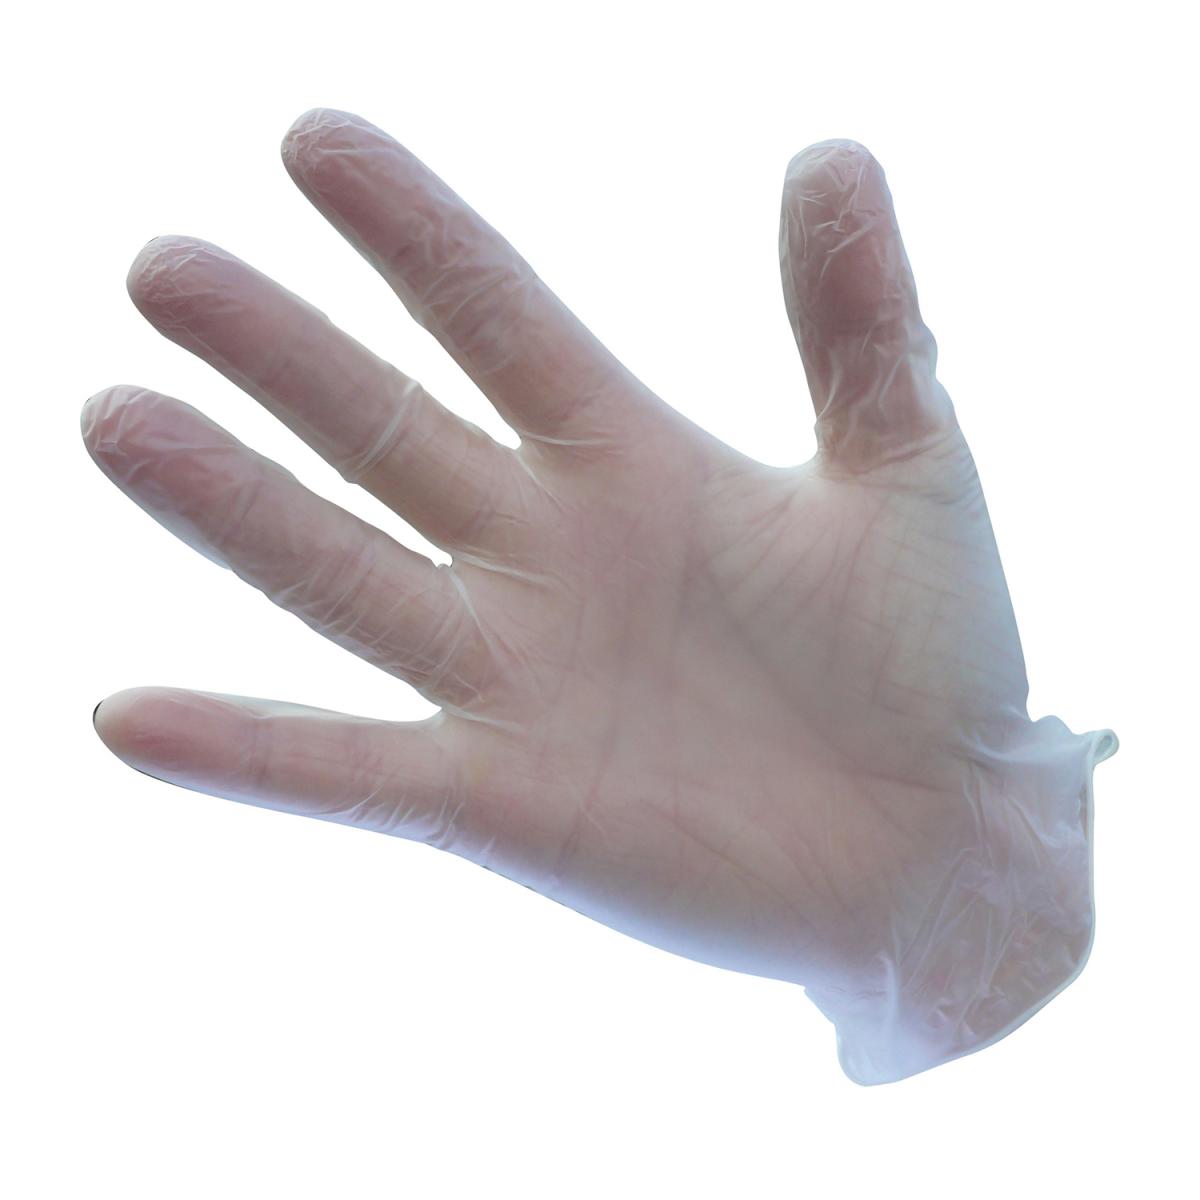 Vinyl Einweghandschuhe gepudert oder ungepudert